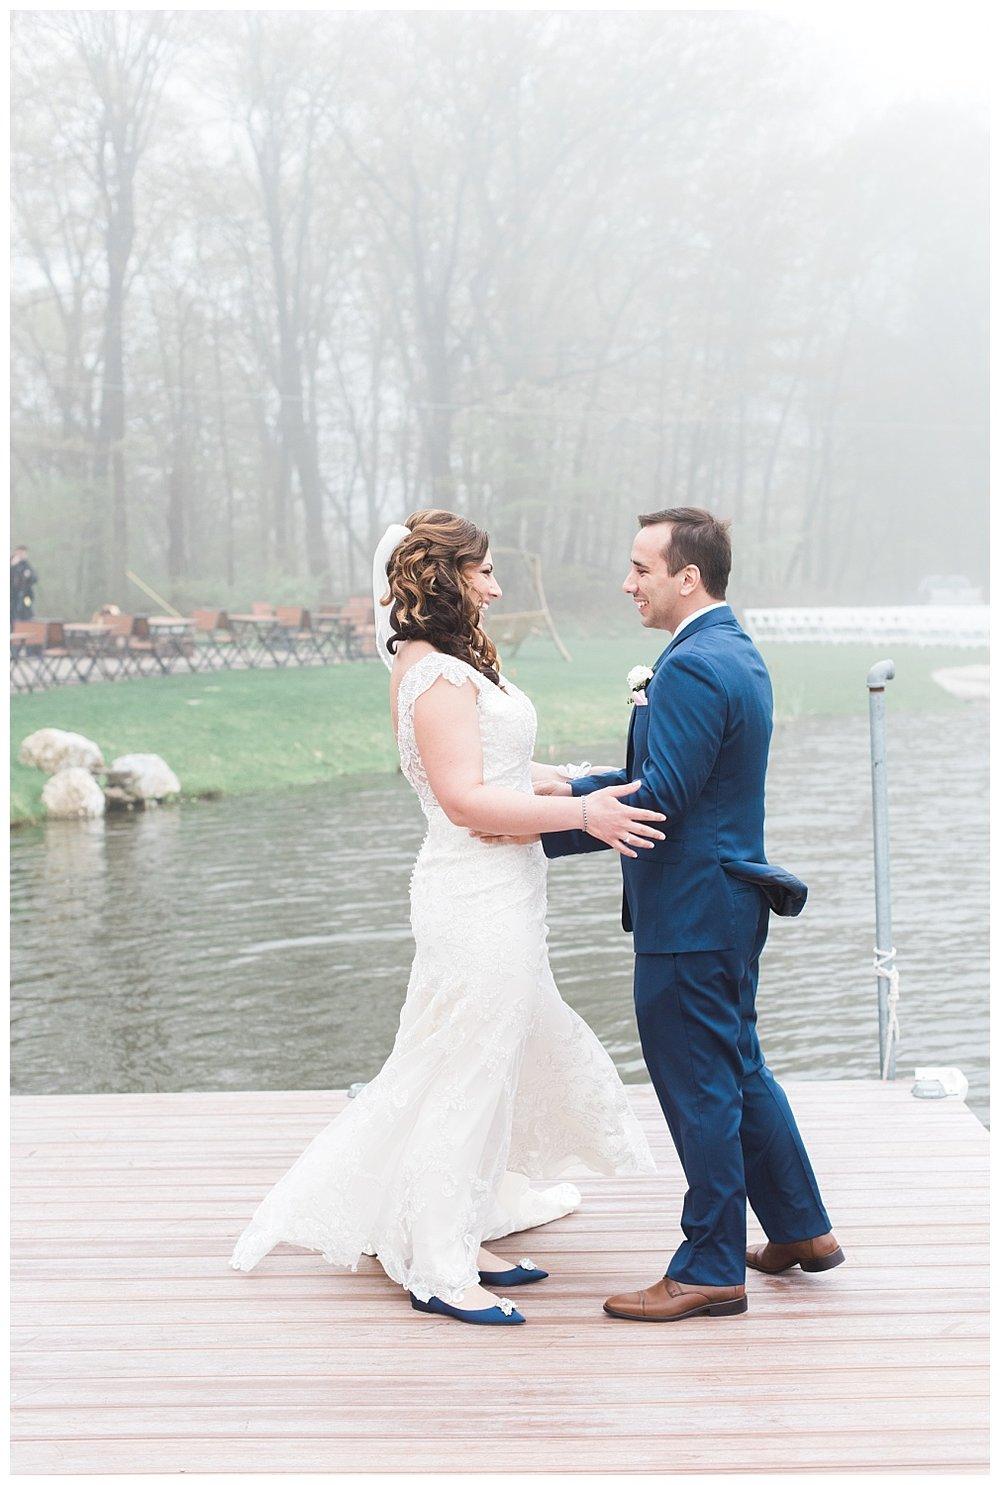 NJ-Wedding-Rock-Island-Lake-Club-Sparta-Navy-Blush-Photographer-Photo-043.JPG